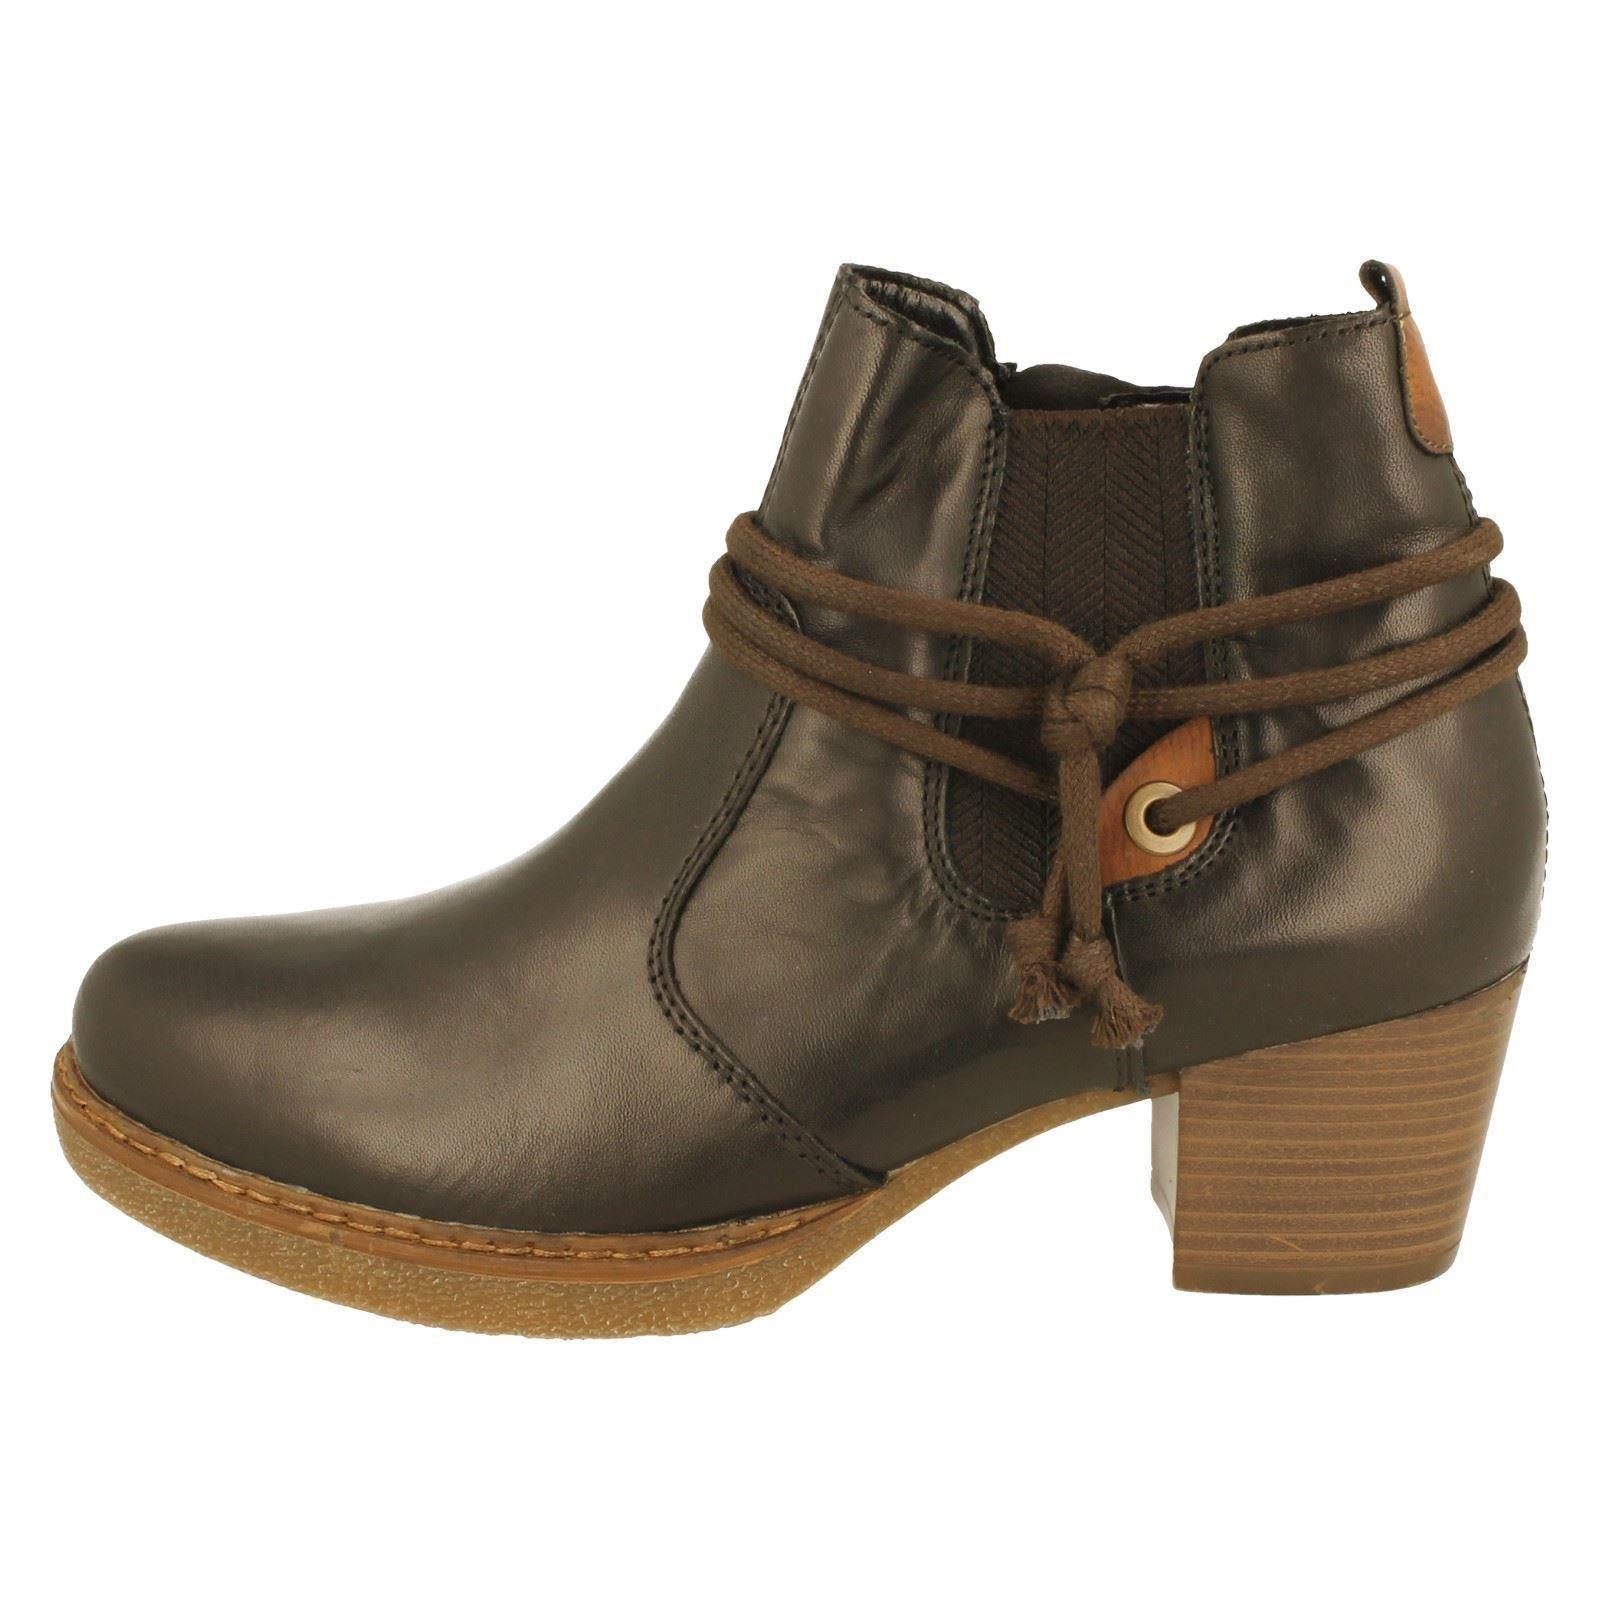 Remonte d8173 Ladies black Ankle Boots Black Leather Combination ZxIIqd